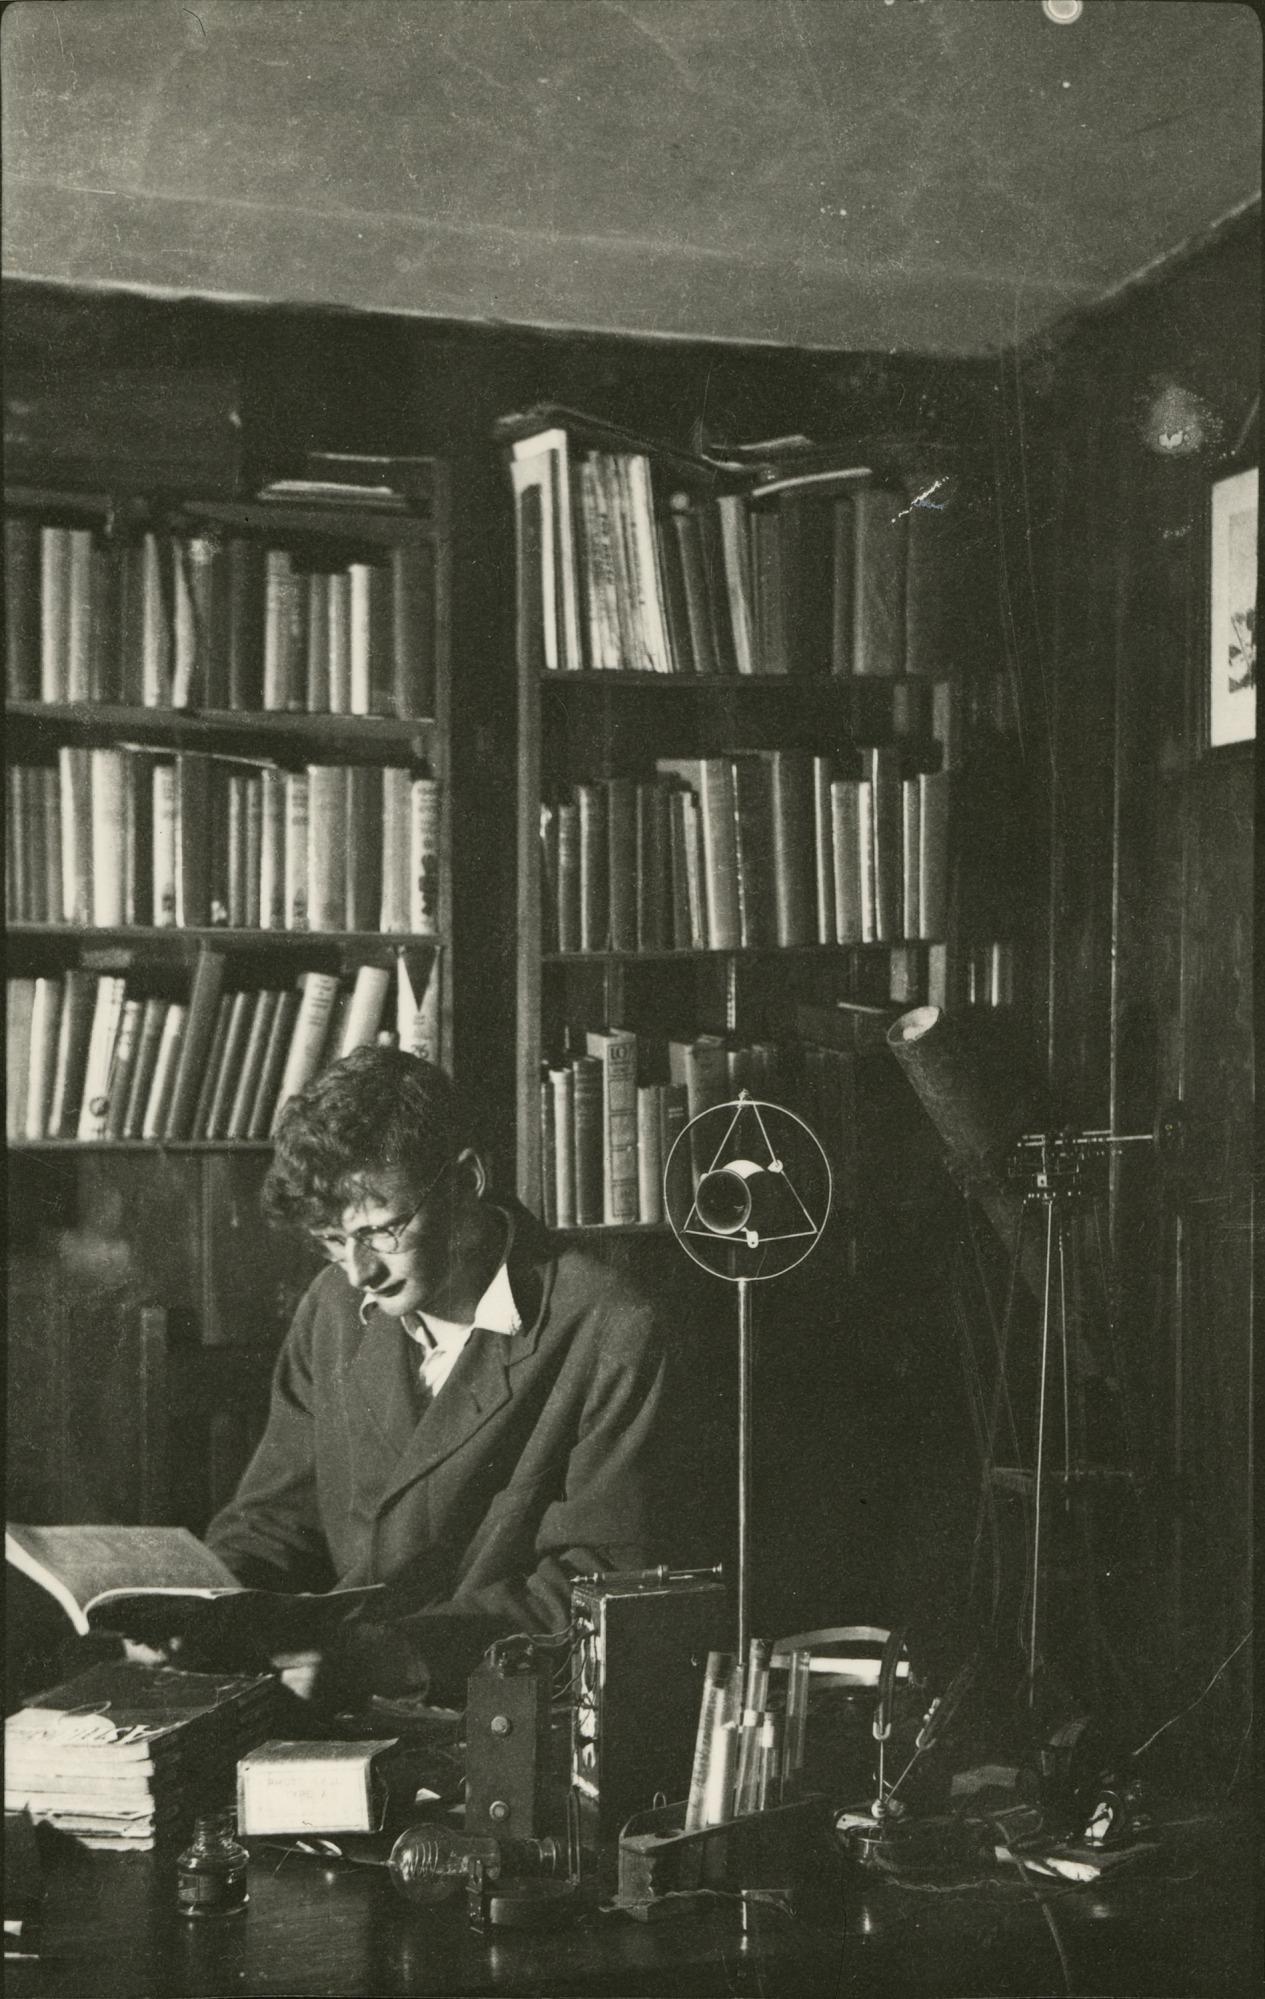 Arthur C. Clarke Collection of Sri Lanka